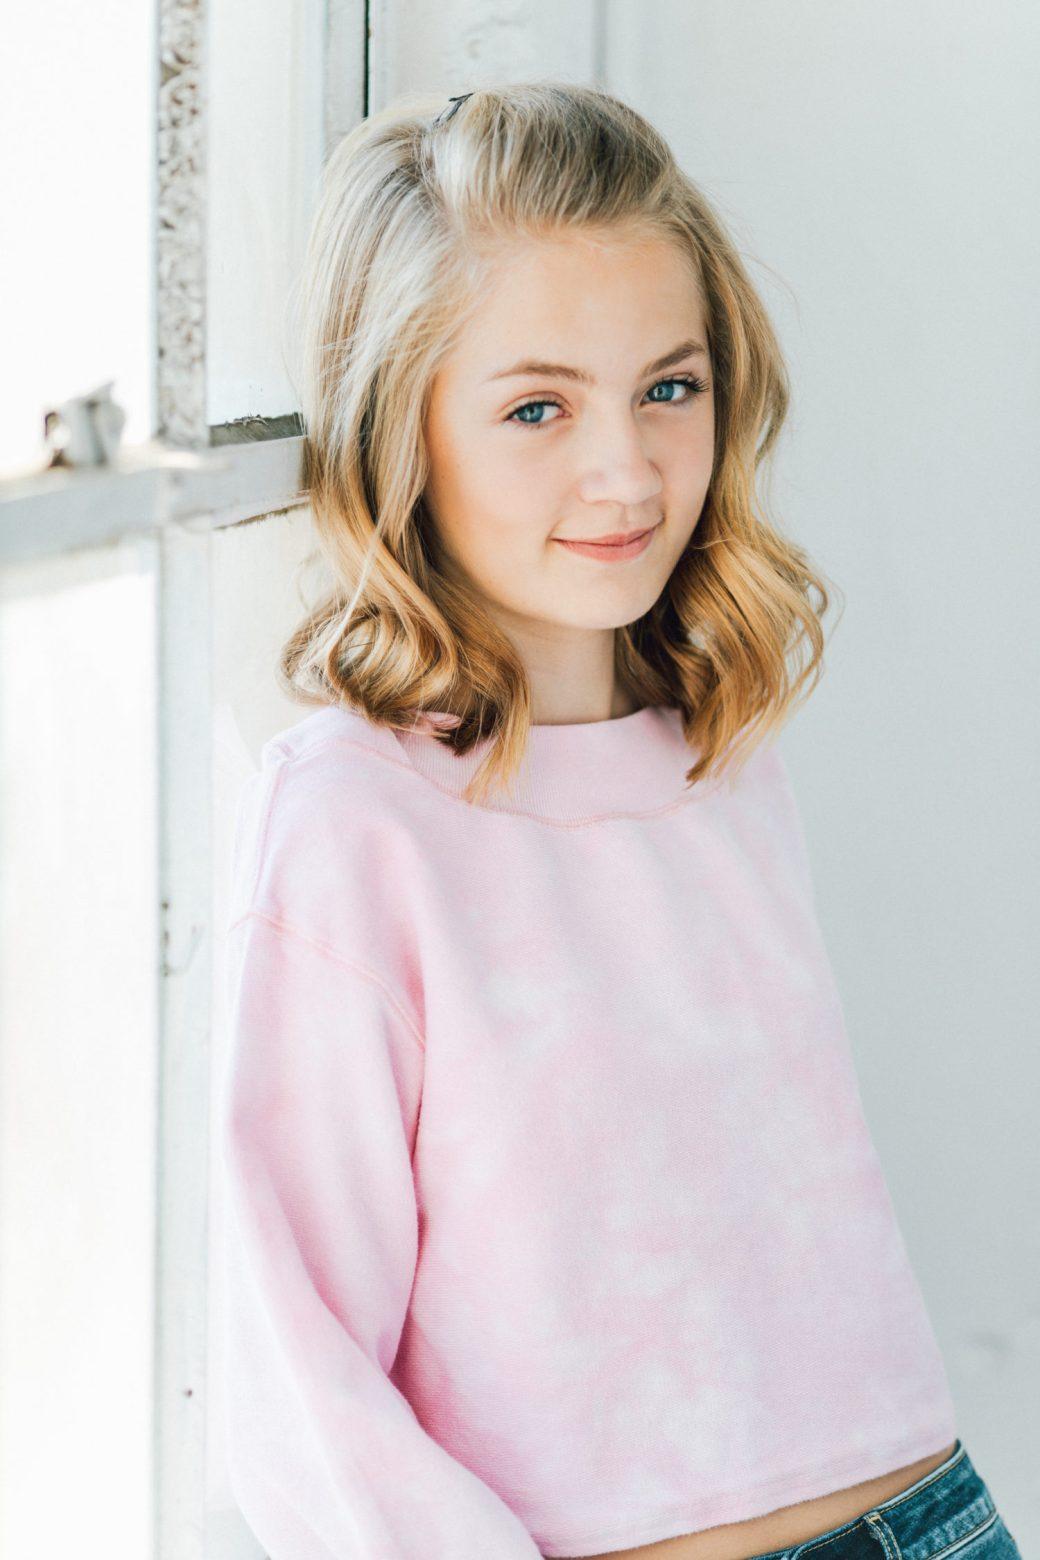 Katie Beth Hall